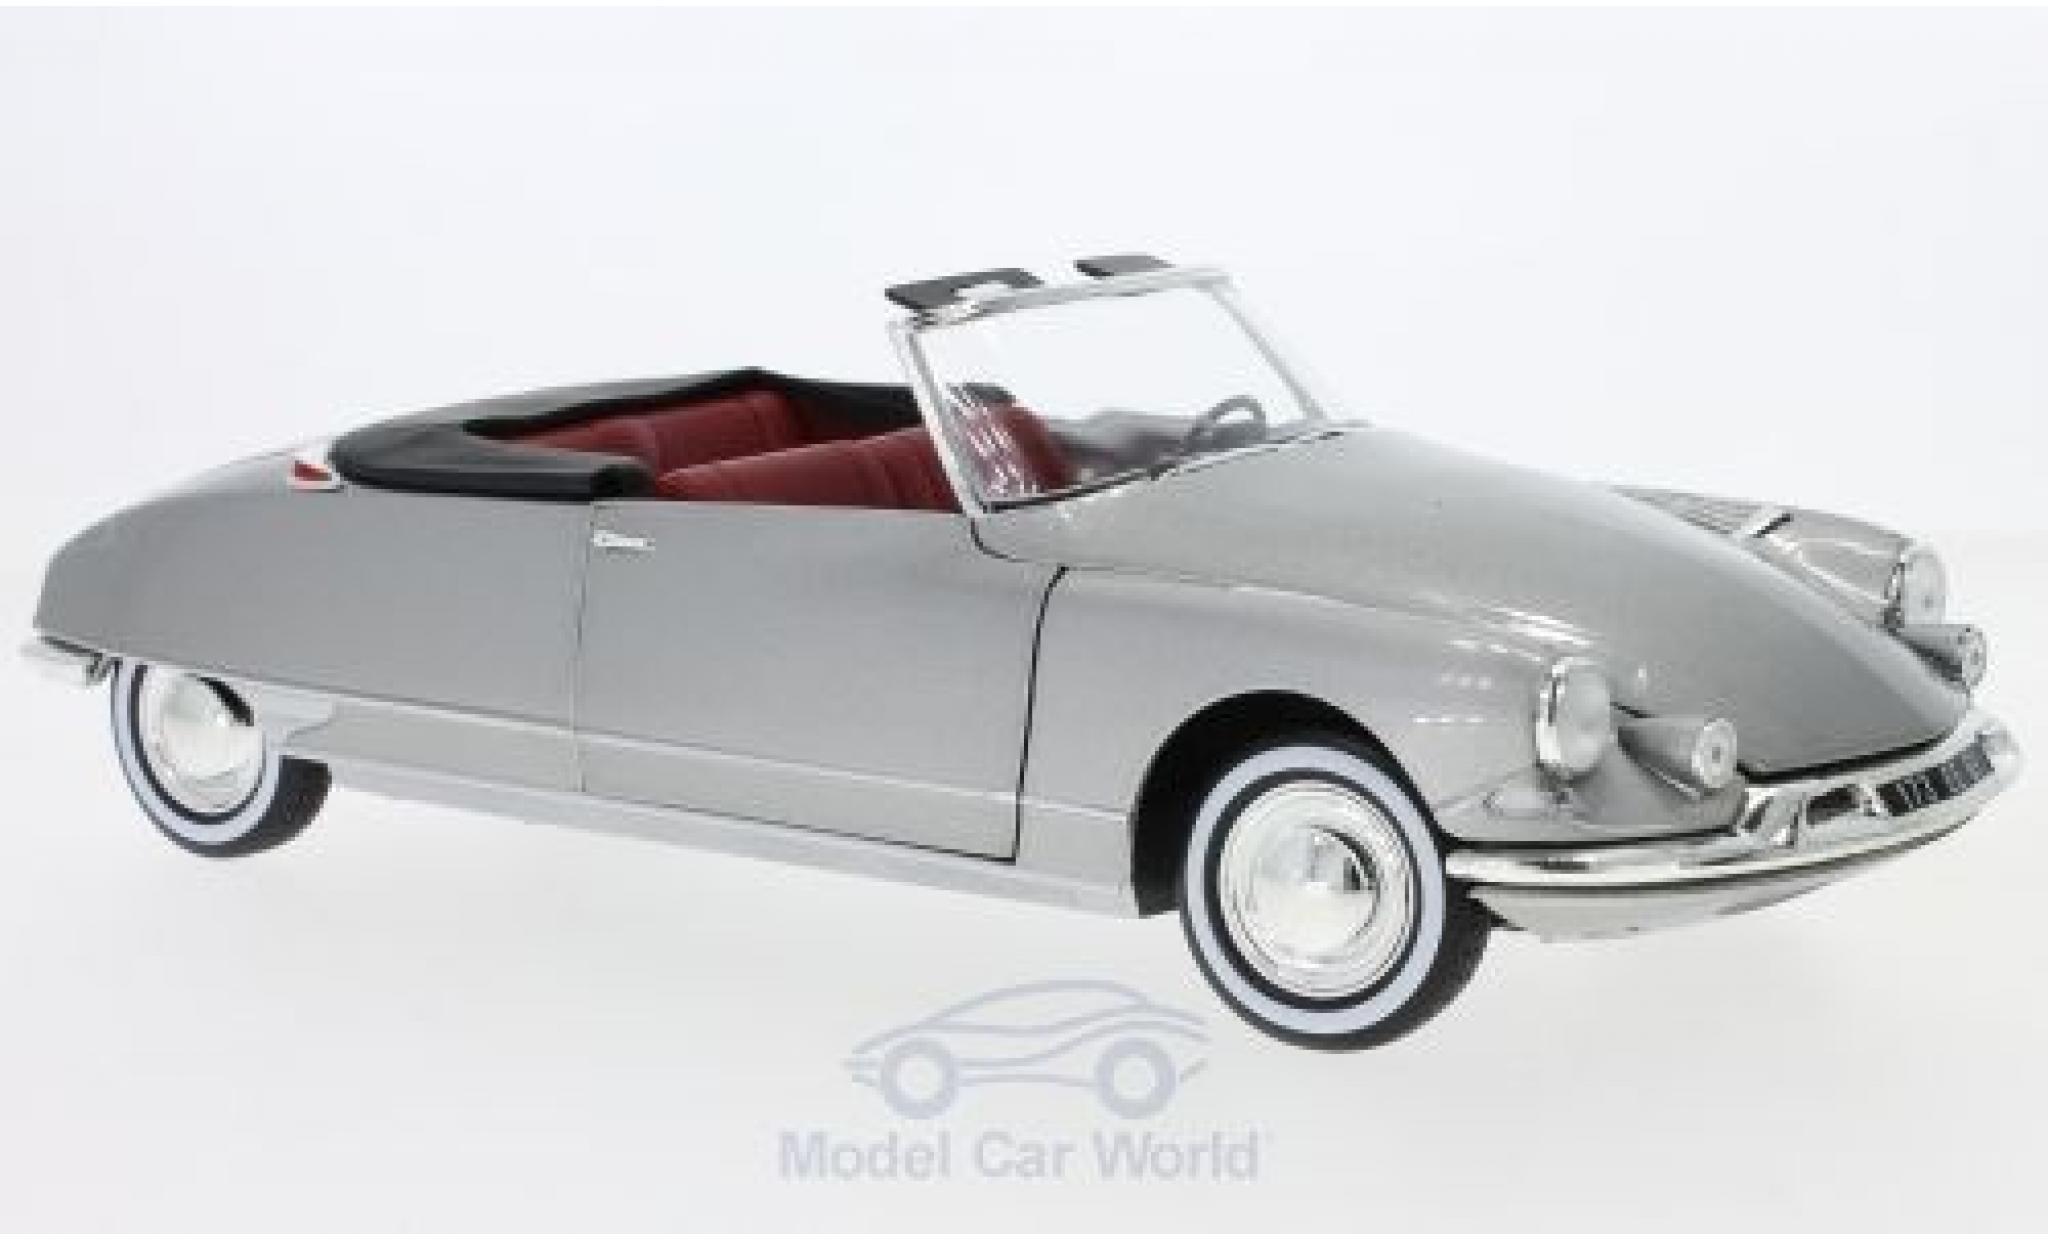 Citroen DS 1/18 Norev 19 Cabriolet métallisé grise 1961 SoftTop liegt bei